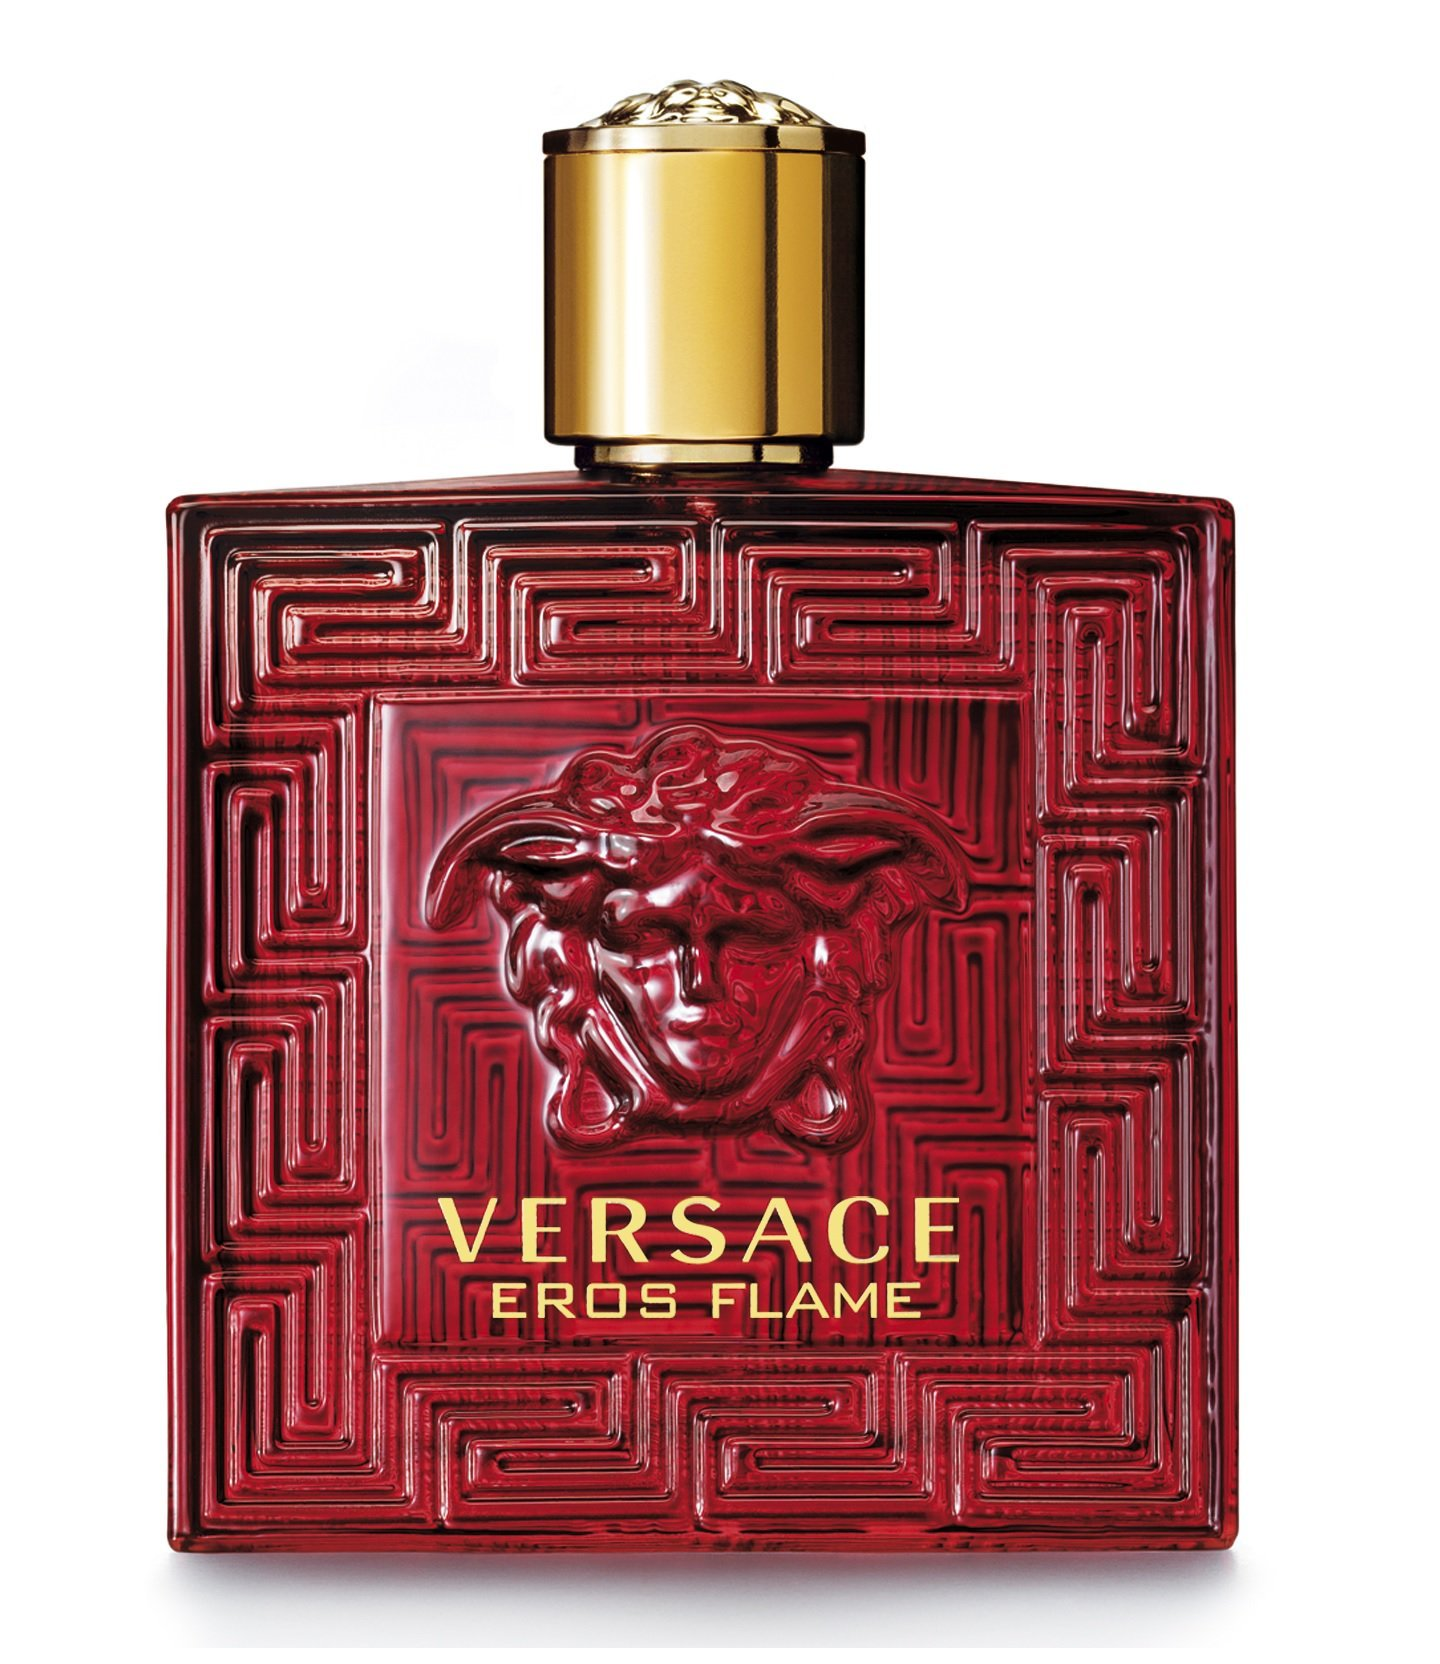 Versace - Eros Flame EDP 50 ml